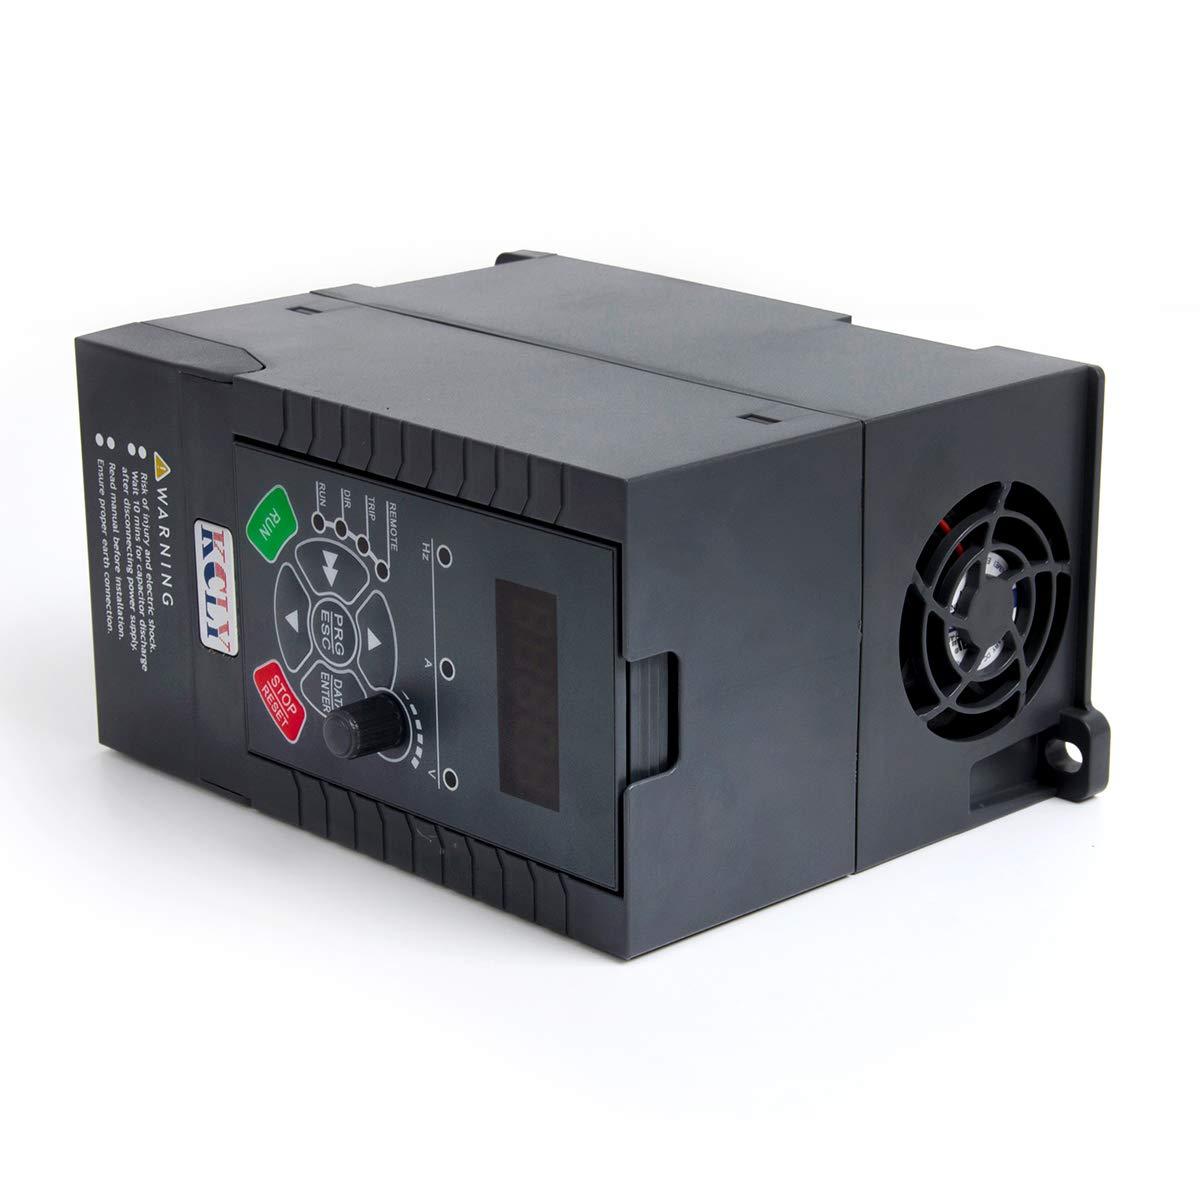 Amazon.com: 1.5KW 2hp 7A 220VAC Single Phase Variable Sd Drive ... on